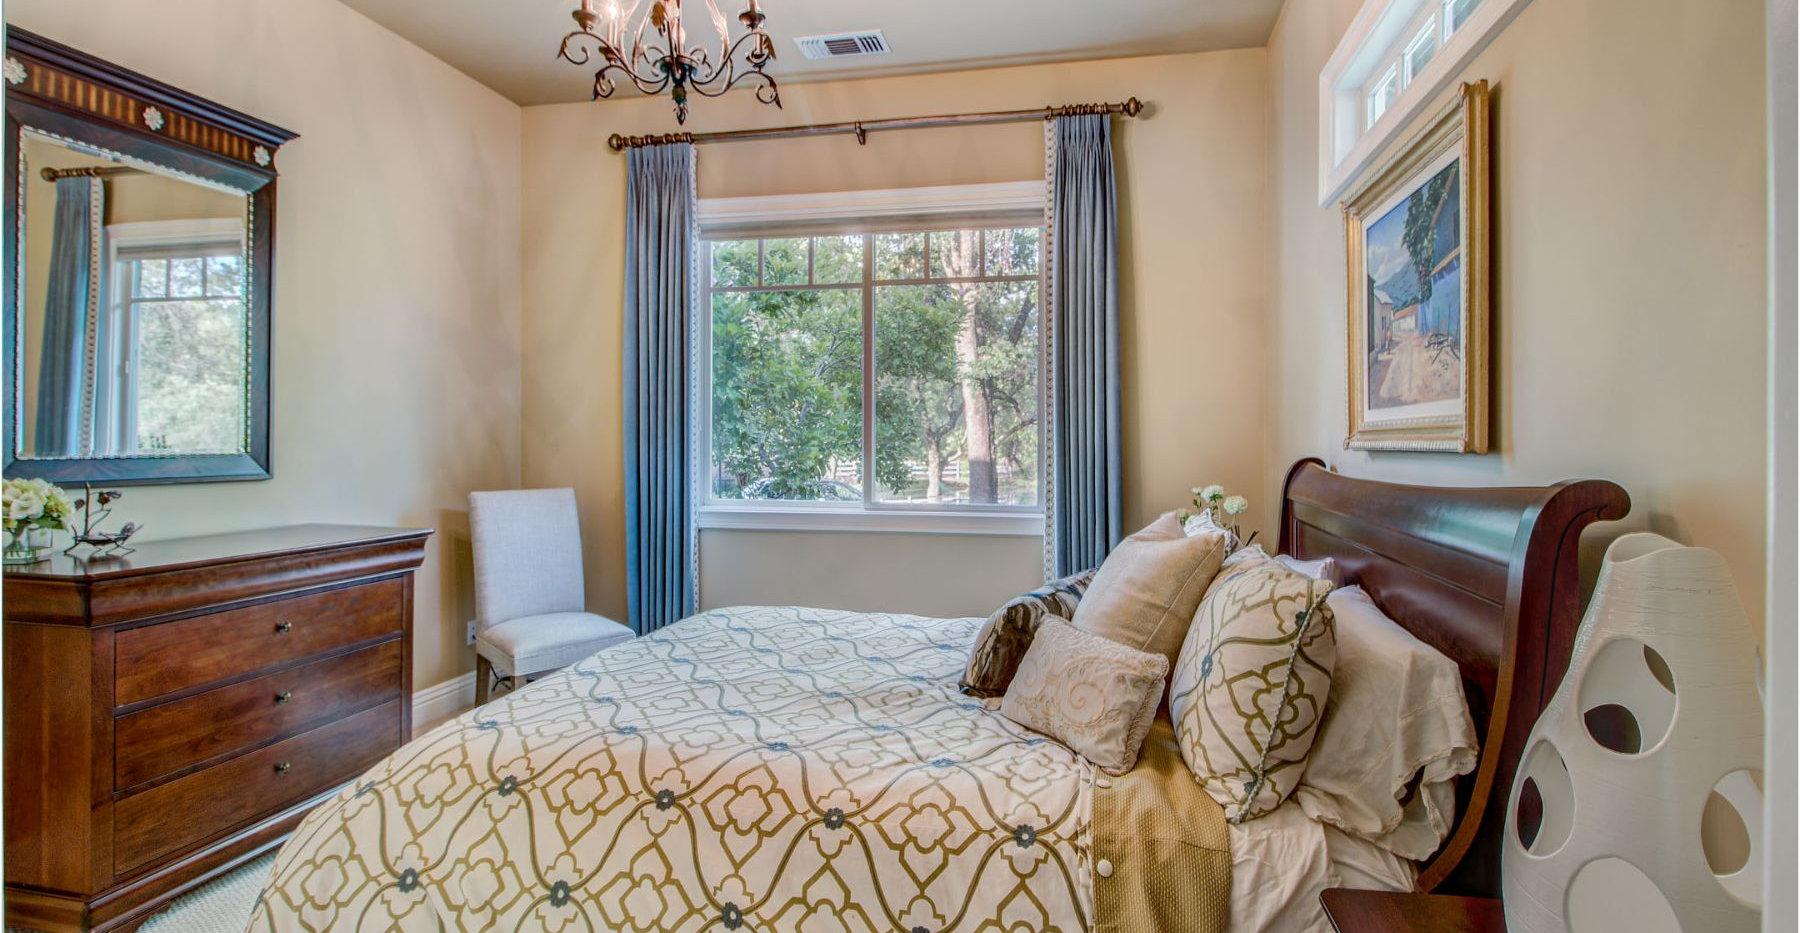 36 Bedroom.jpg